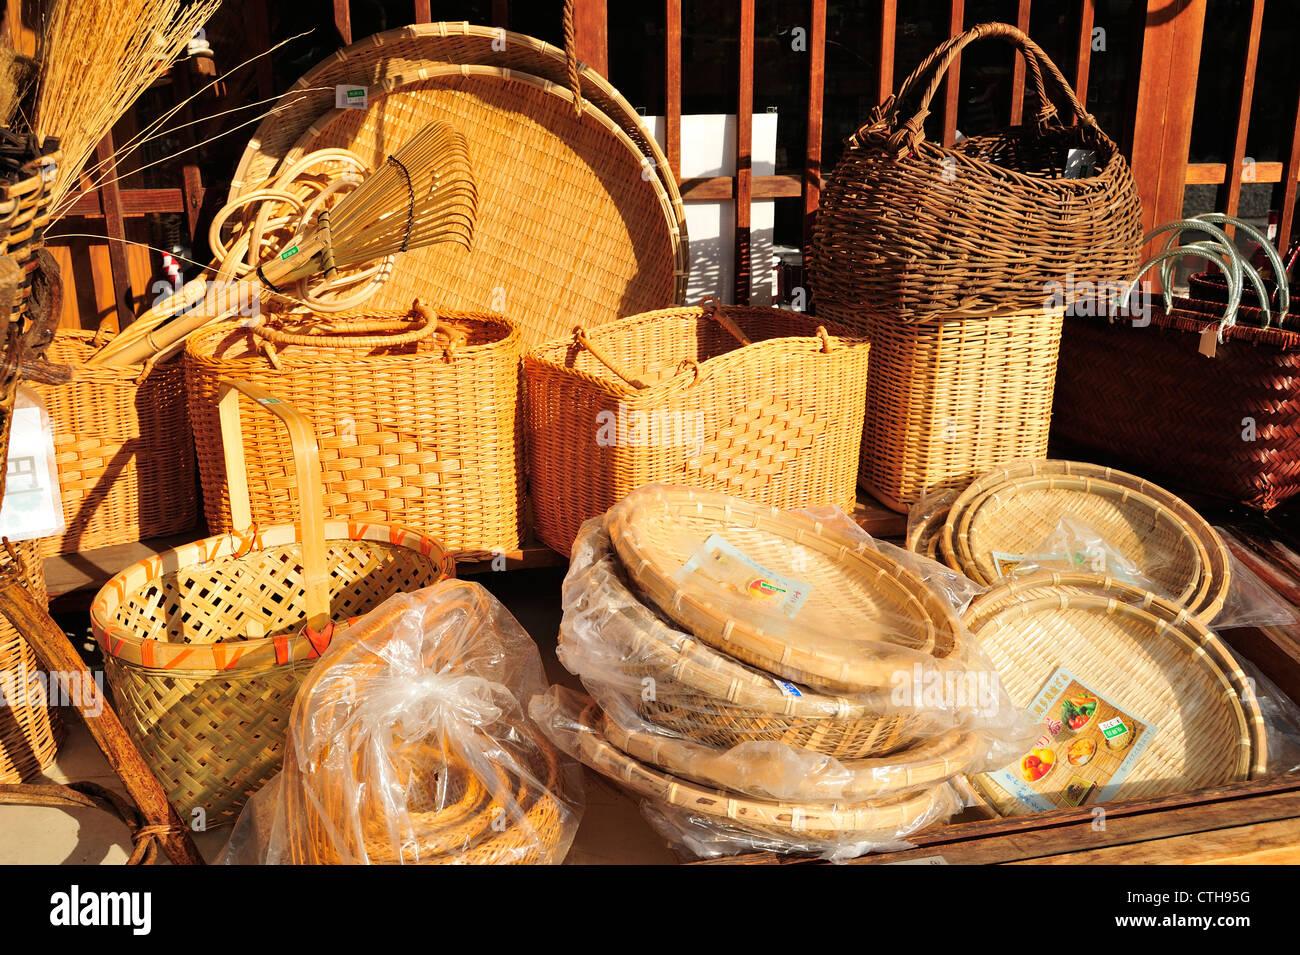 Souvenirs, Shirakawa-go, Gifu Prefecture, japan - Stock Image